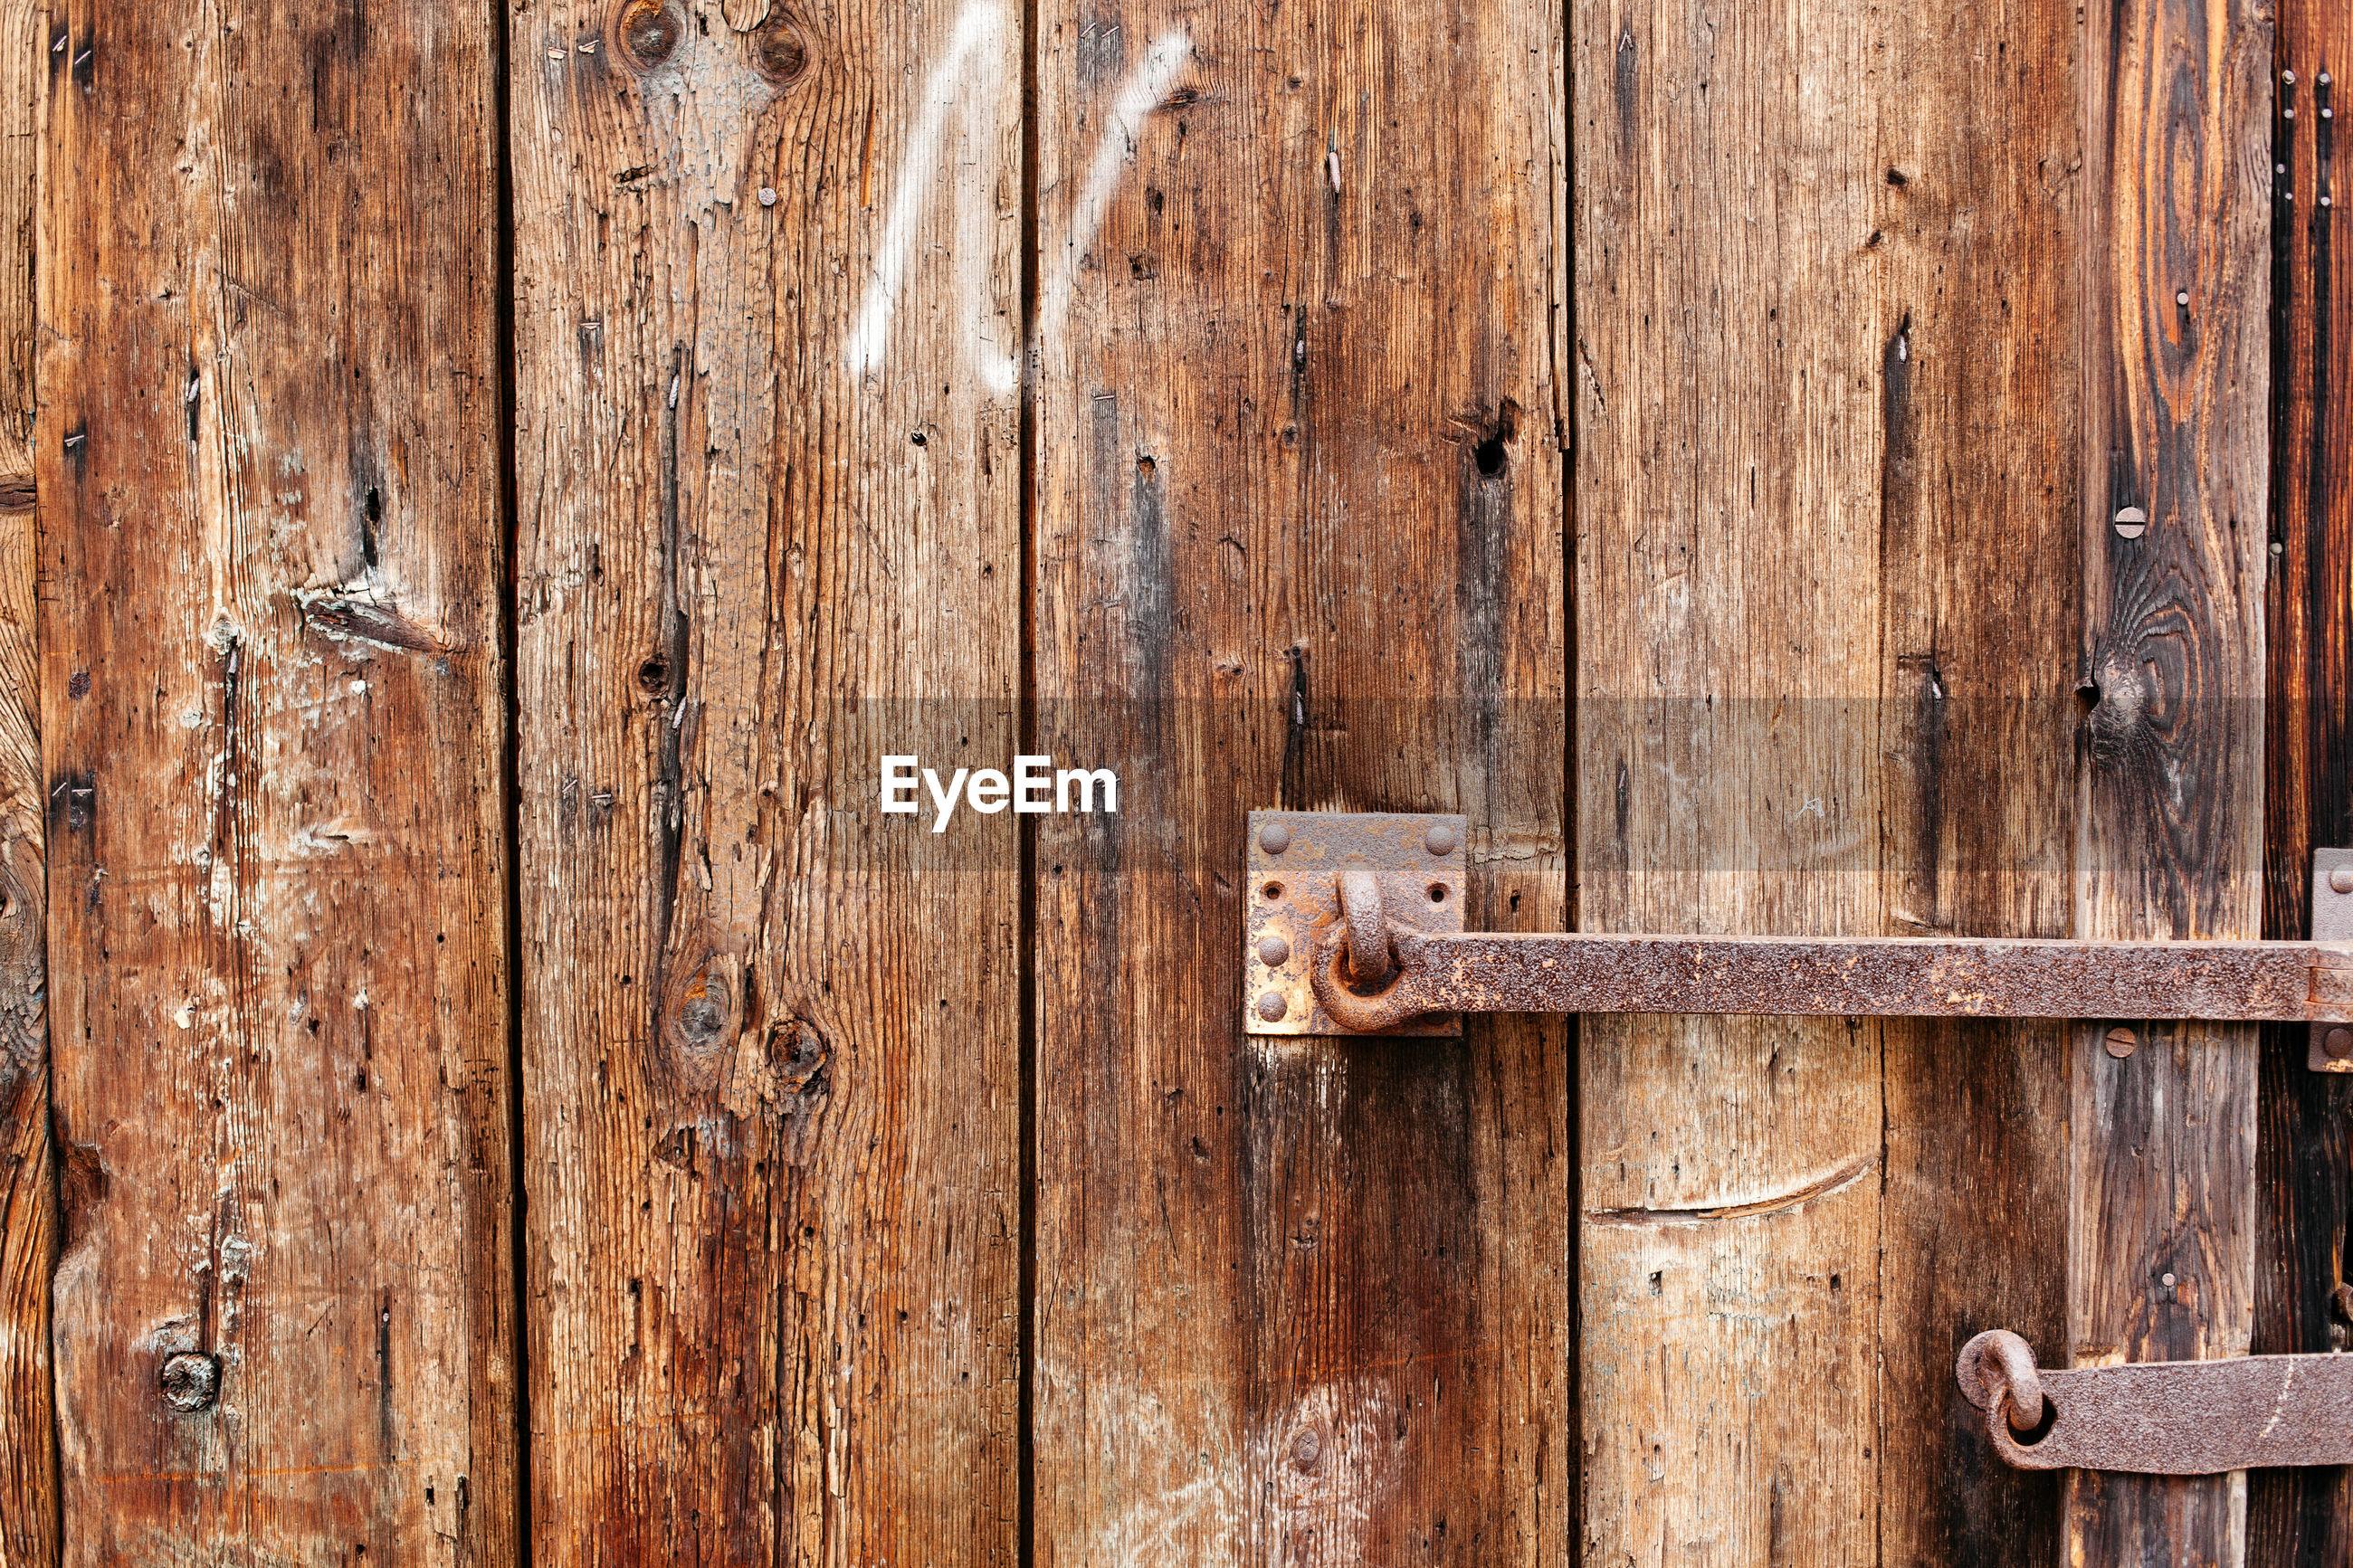 Full frame image of old weathered wood